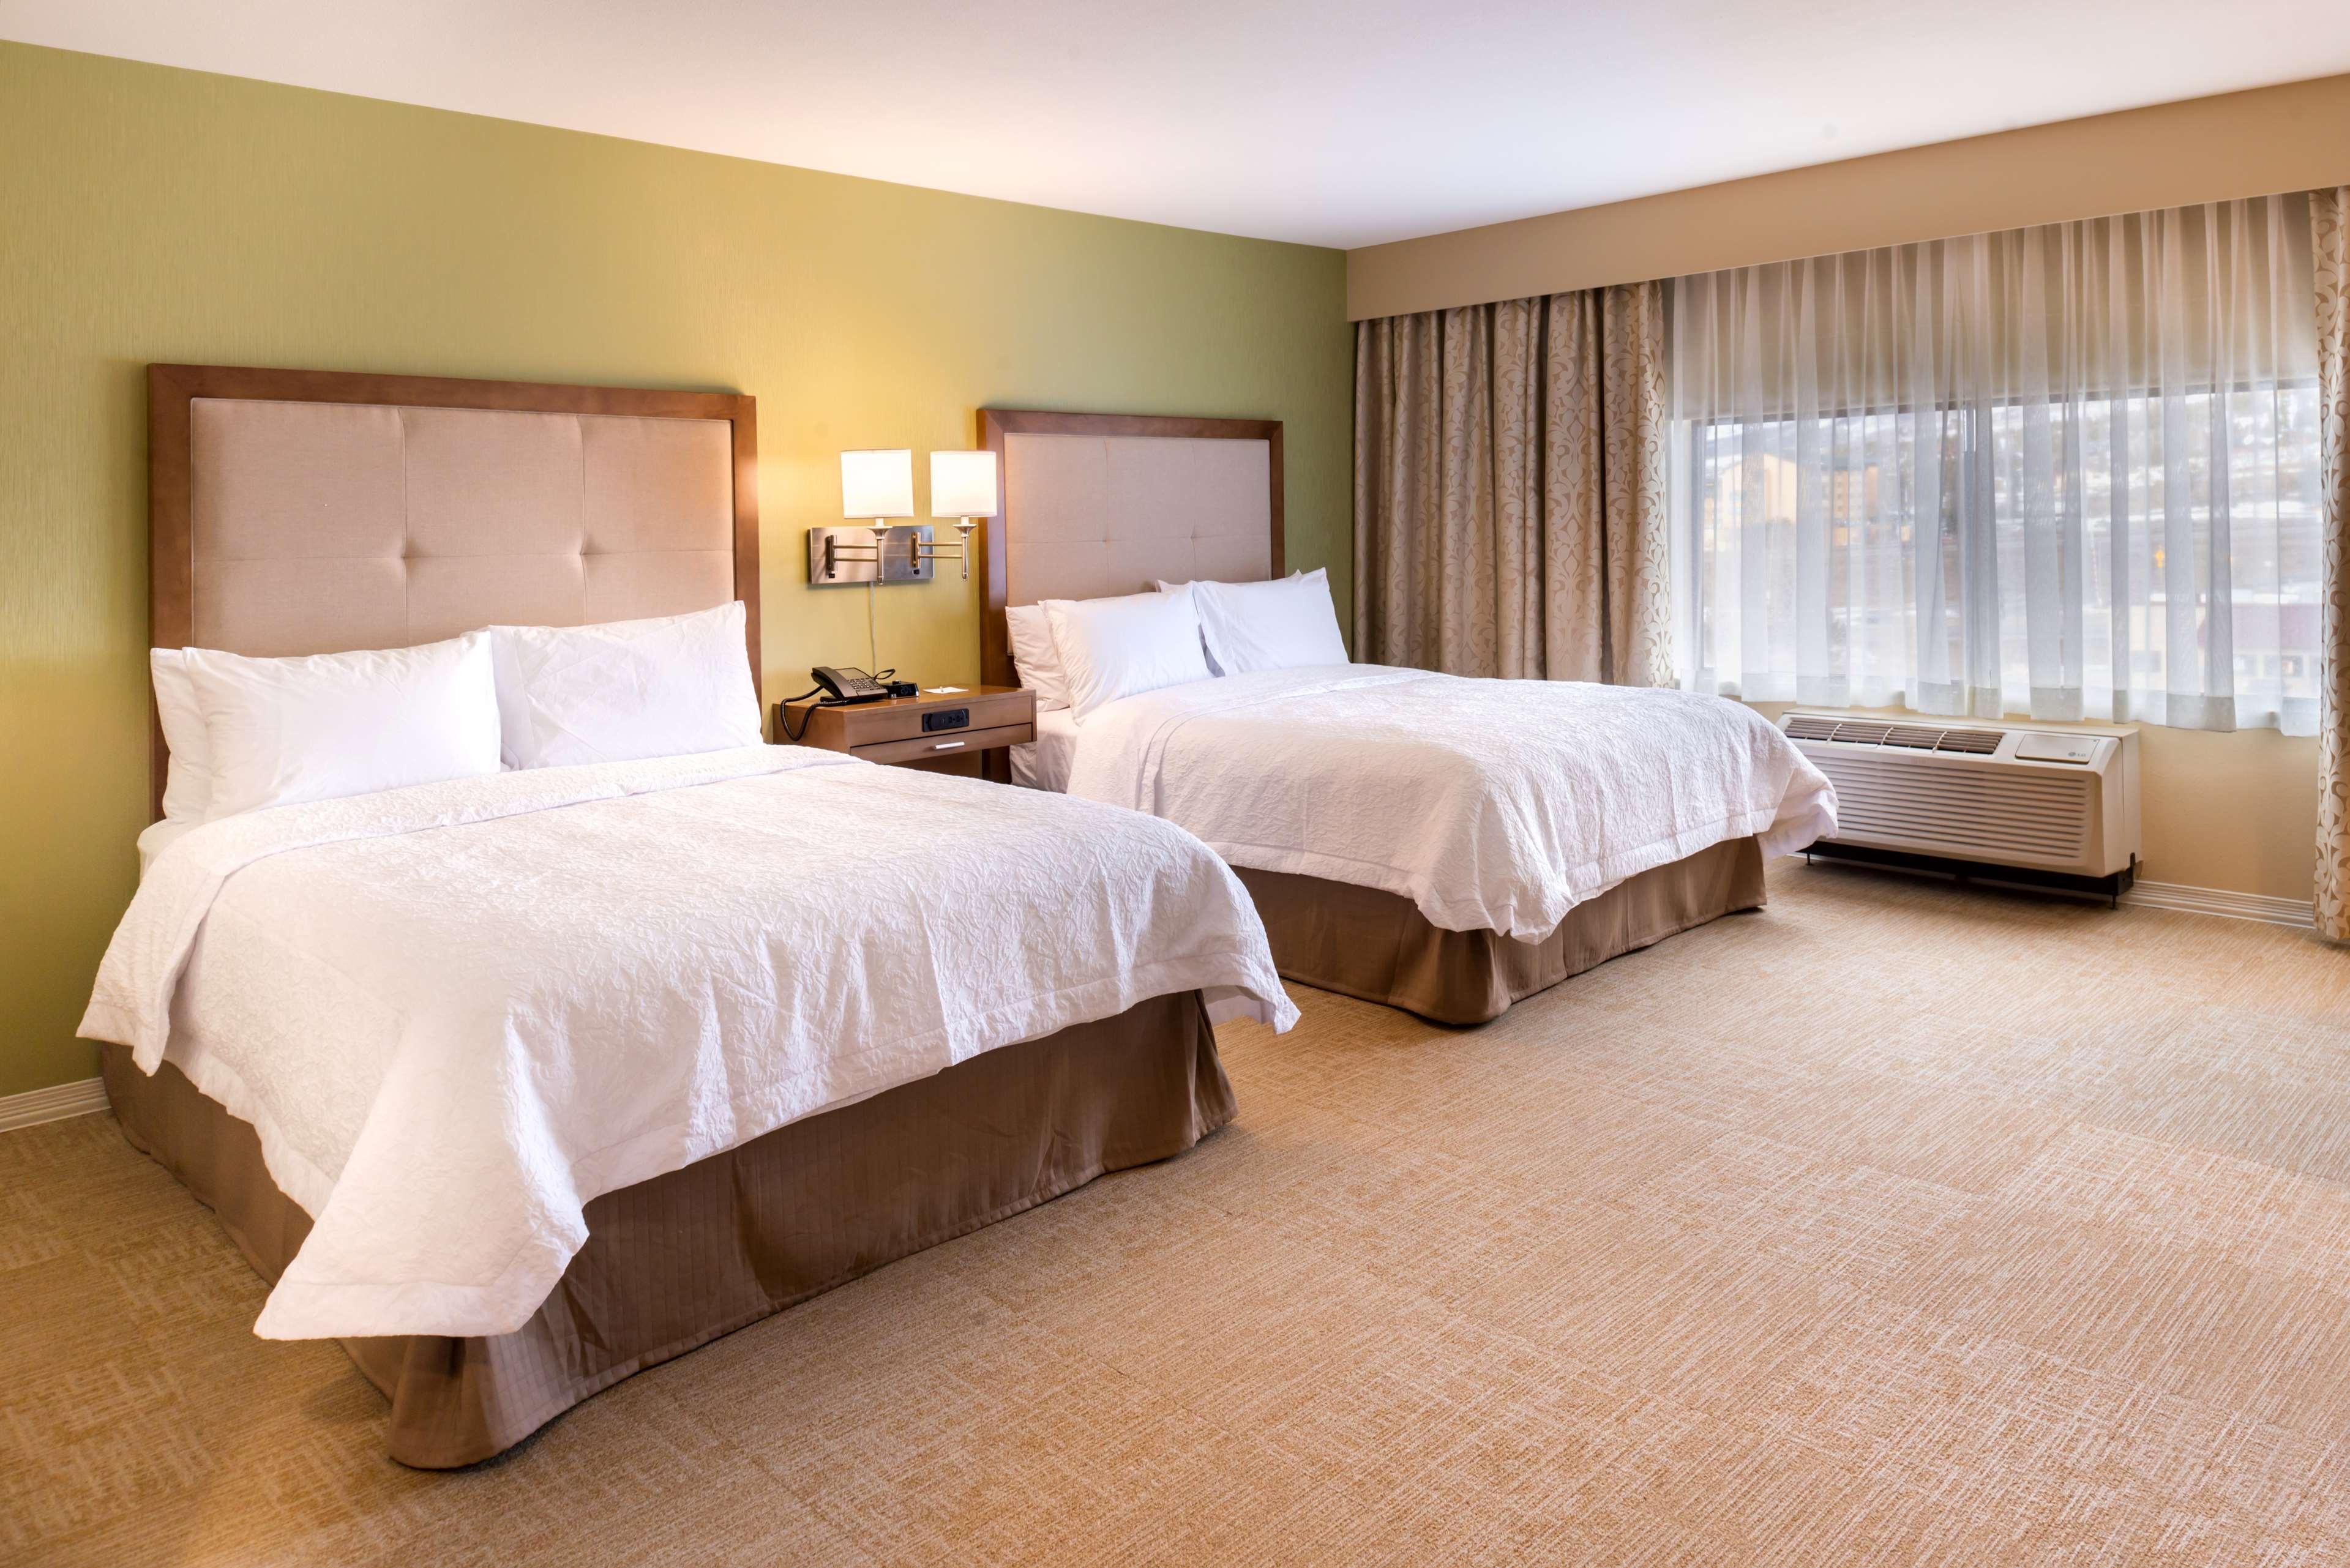 Hampton Inn & Suites Silverthorne image 17